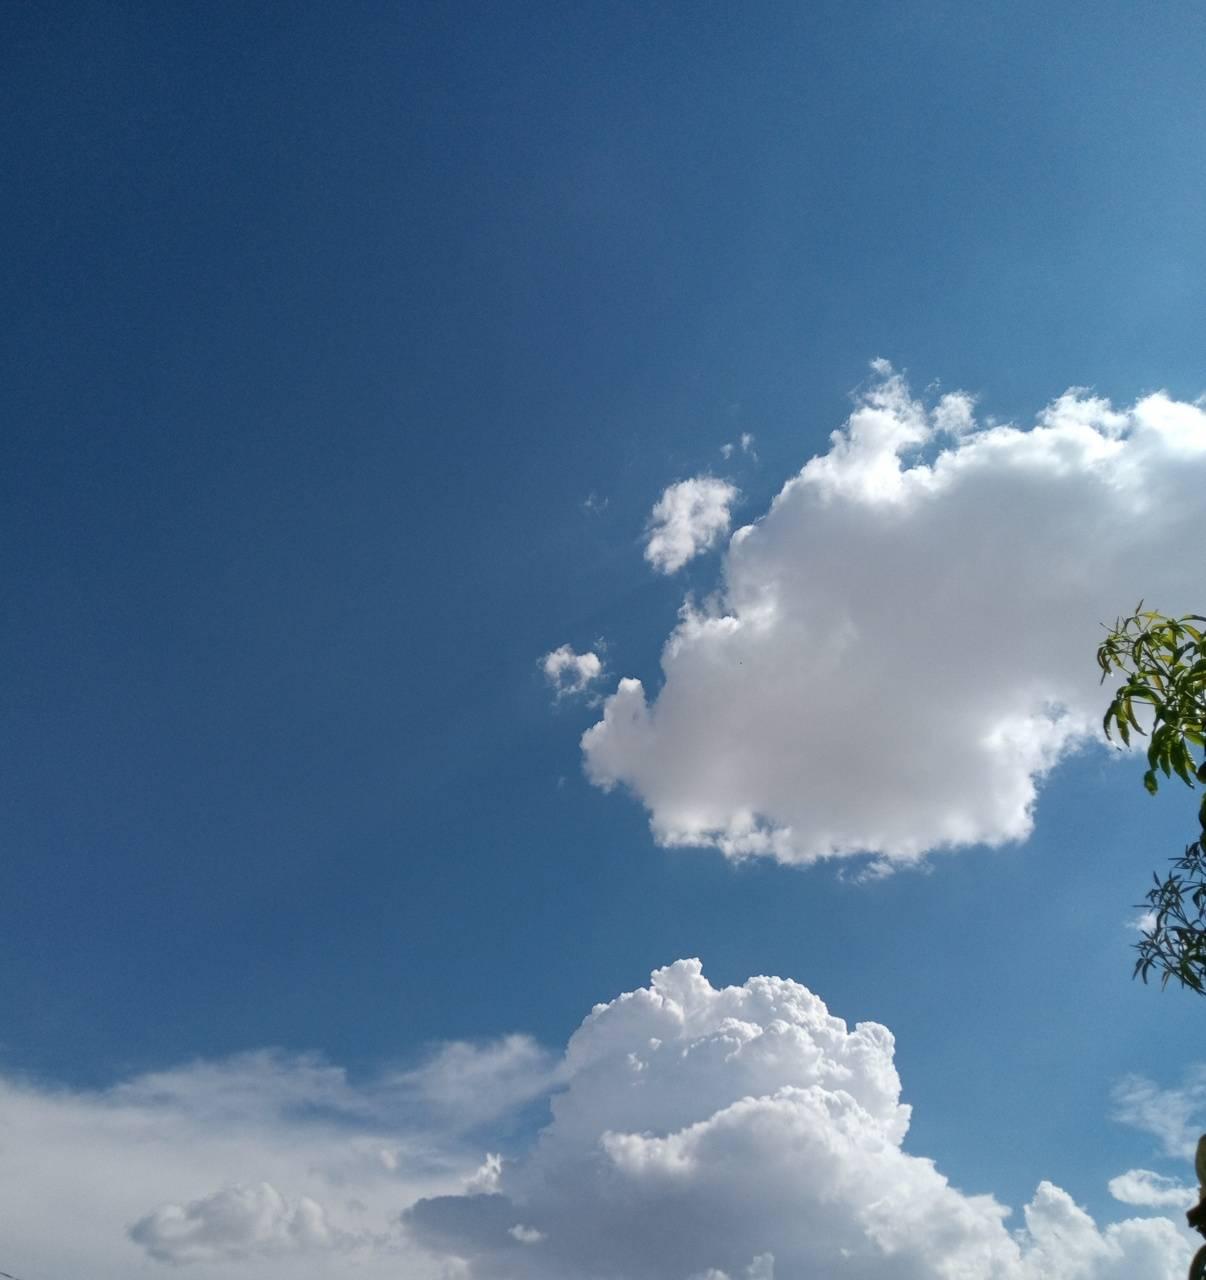 Sky good